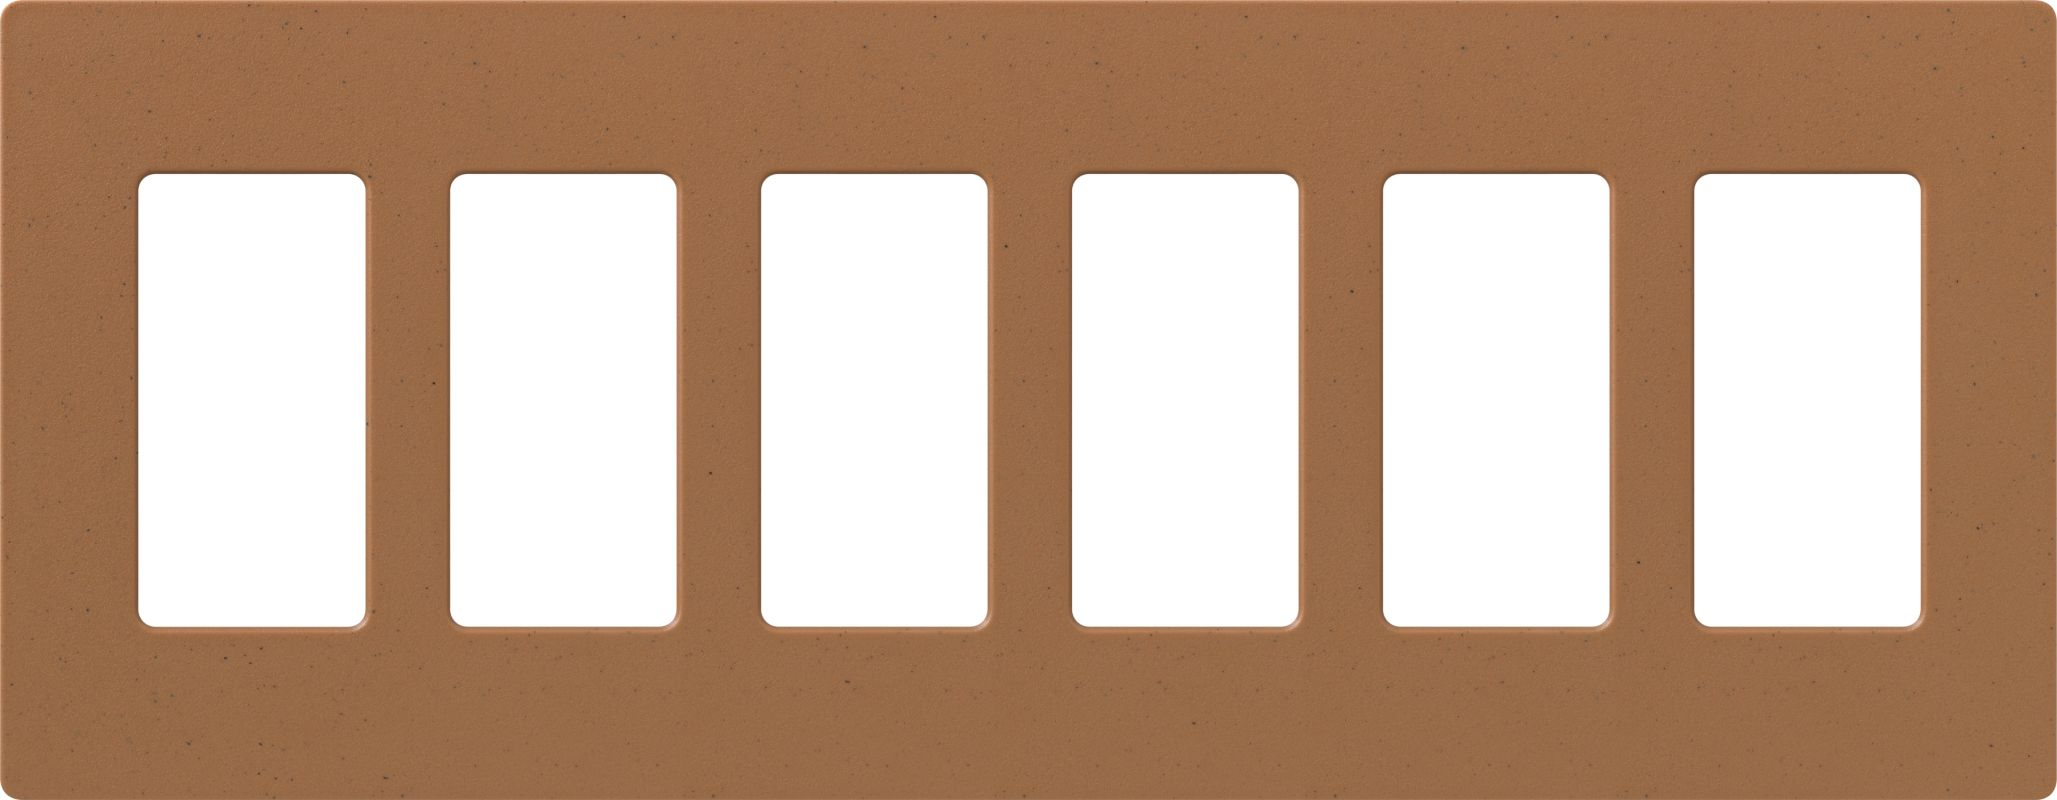 Lutron CW-6 Claro Six Gang Designer Wall Plate Terracotta Wall